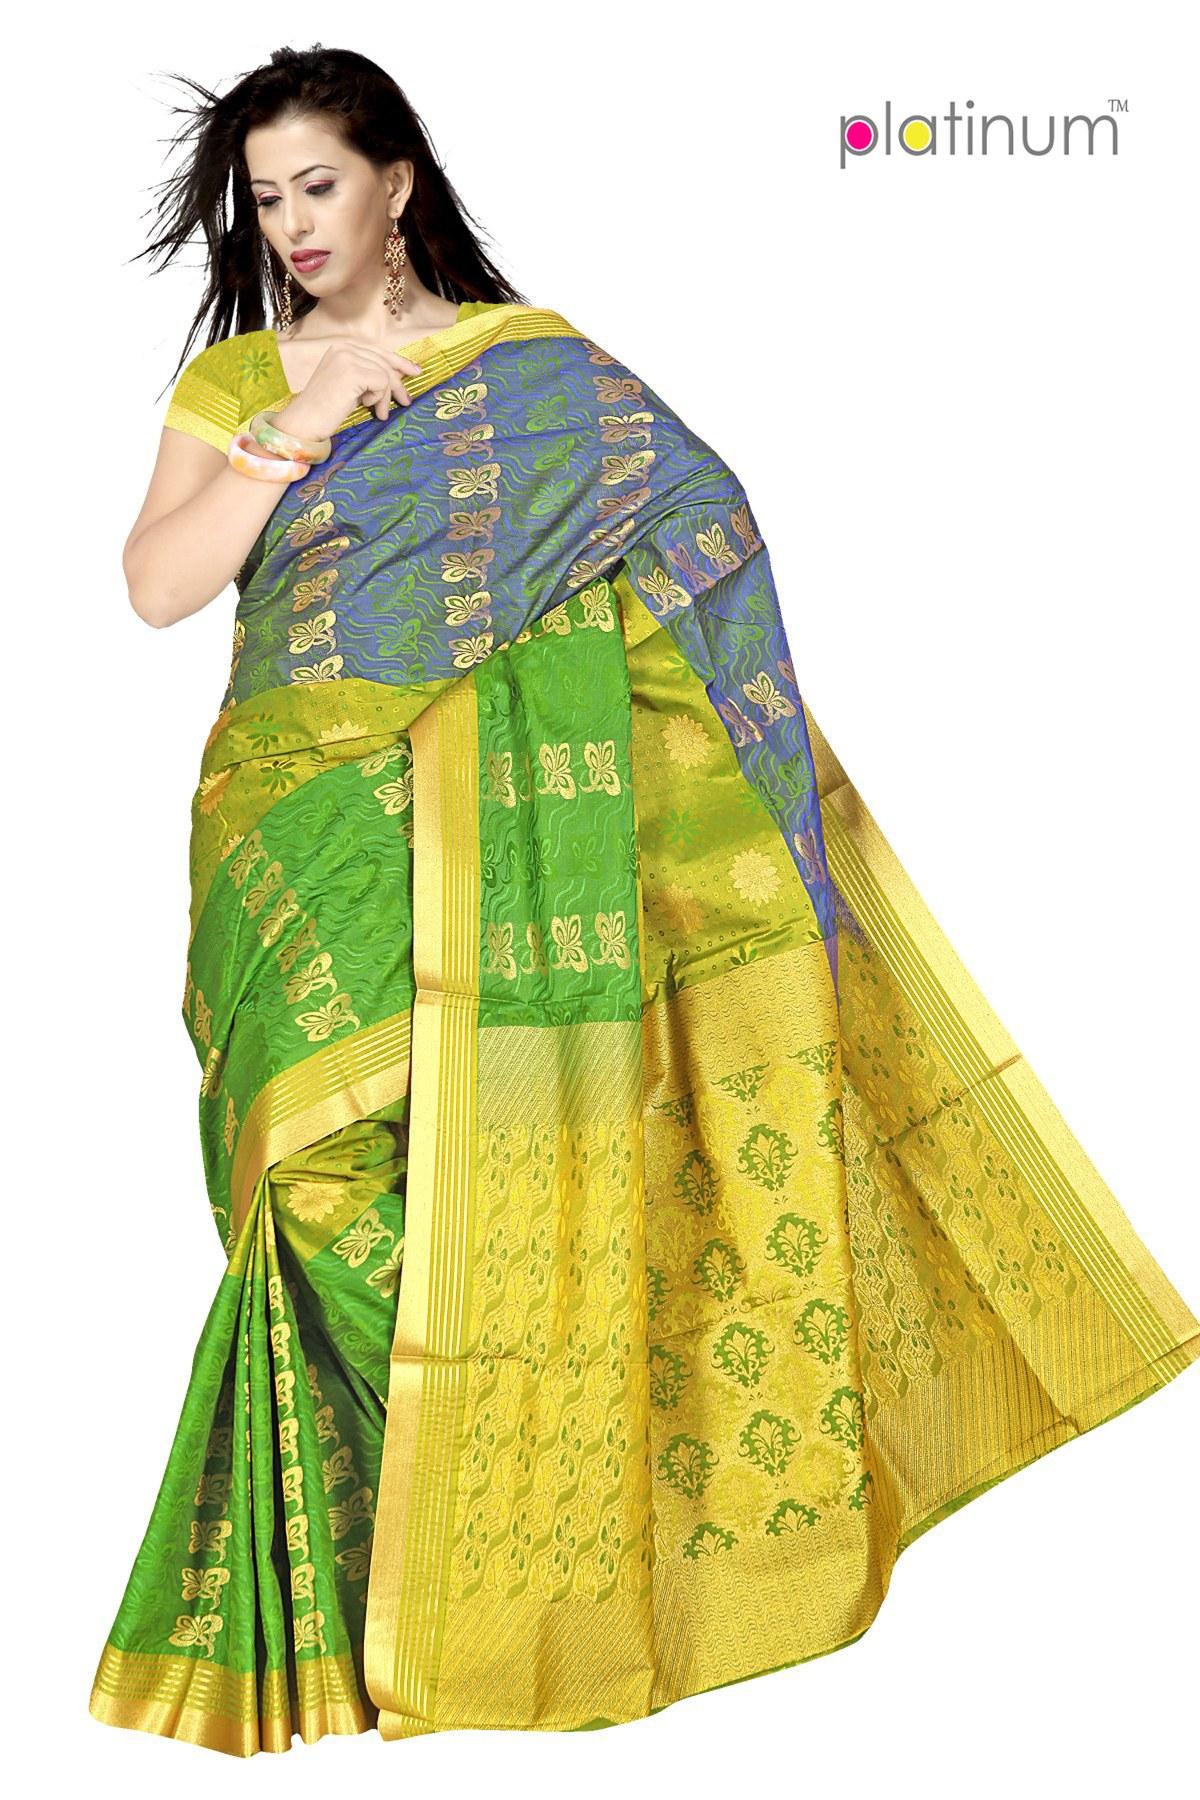 lime green designer zari saree ps327 online shopping for silk sarees by platinum online shopping. Black Bedroom Furniture Sets. Home Design Ideas